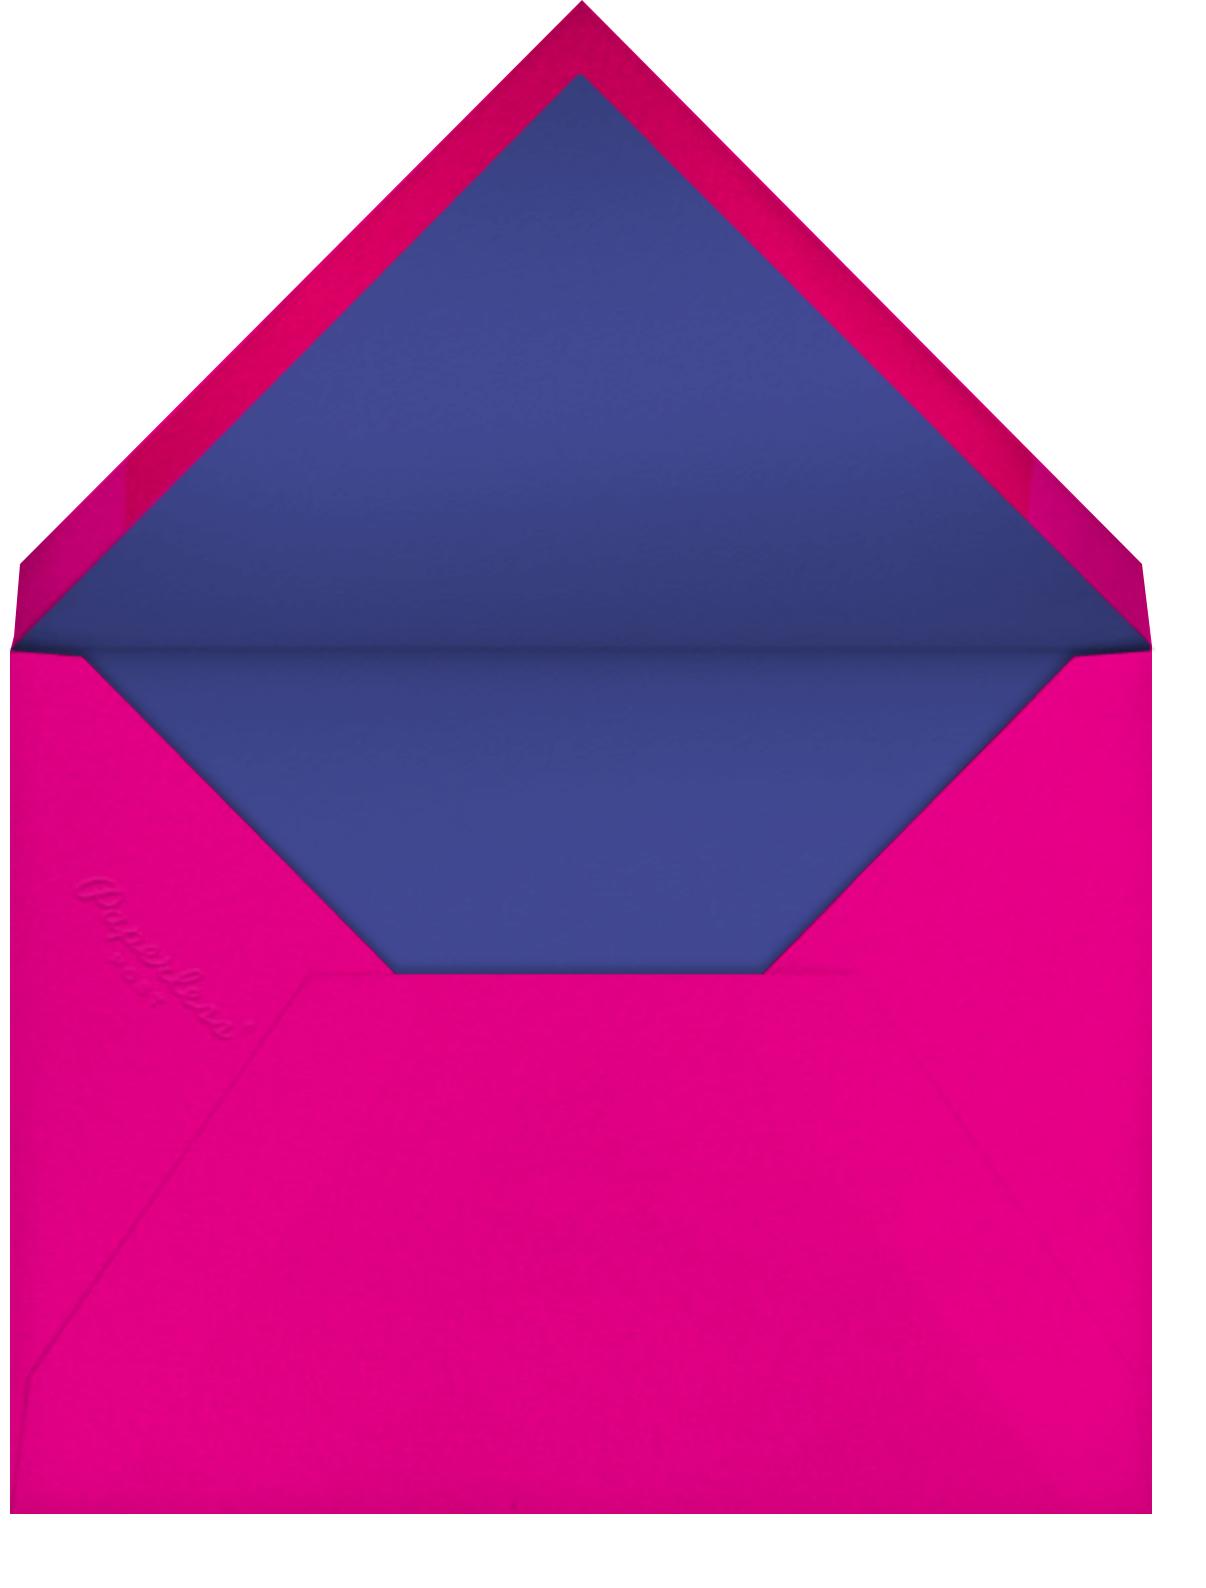 Choli (Invitation) - Indigo - Paperless Post - All - envelope back